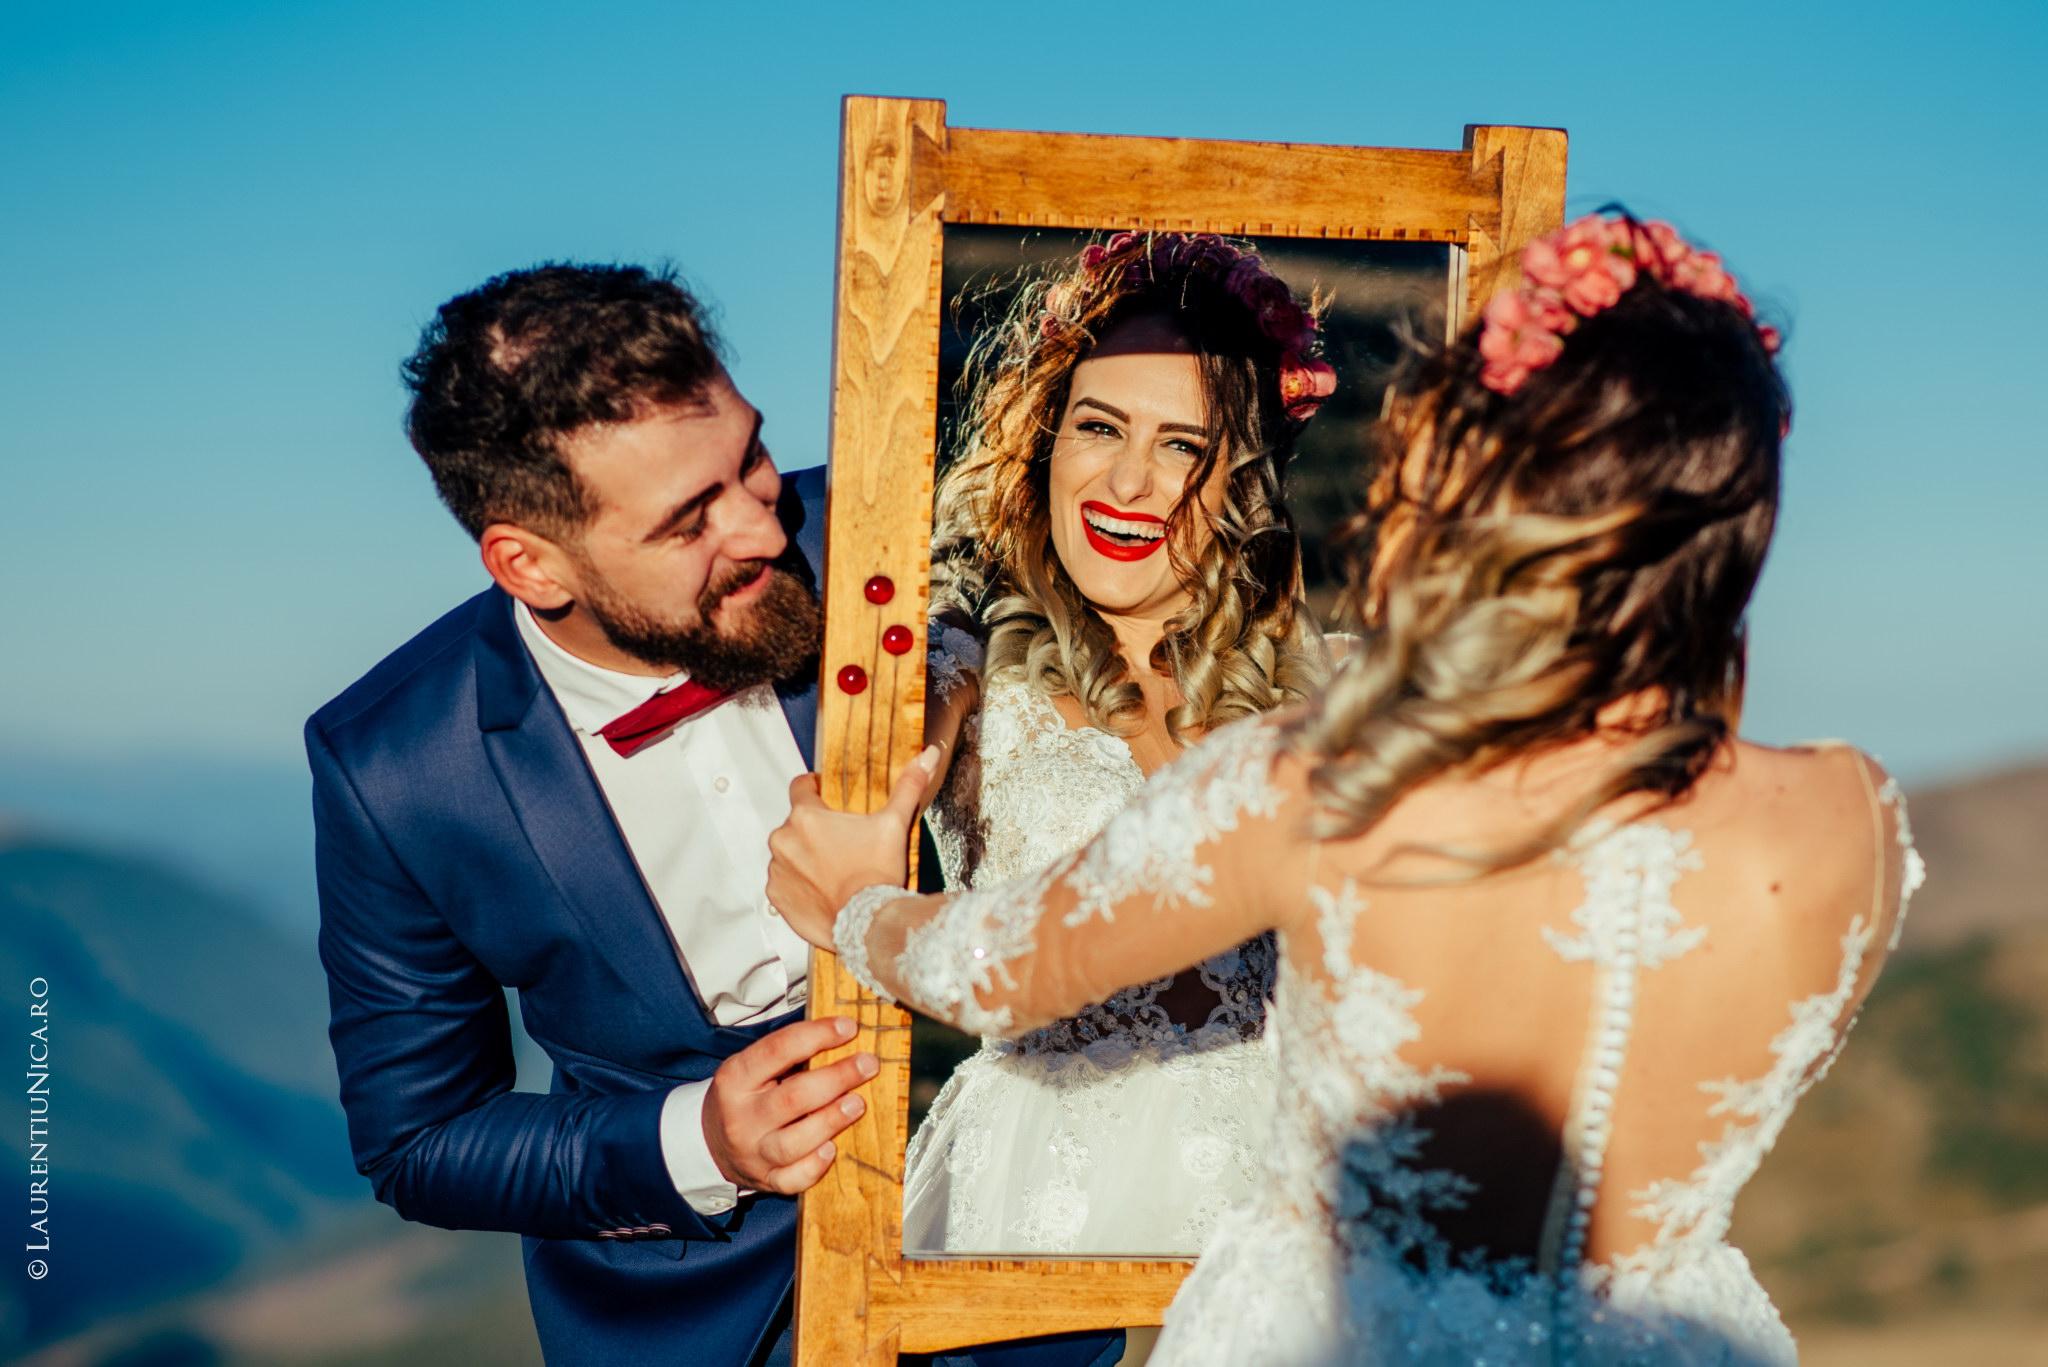 aida si alin fotograf nunta laurentiu nica transalpina 23 - Aida & Alin | Fotografii After Wedding | Transalpina - Muntii Parang